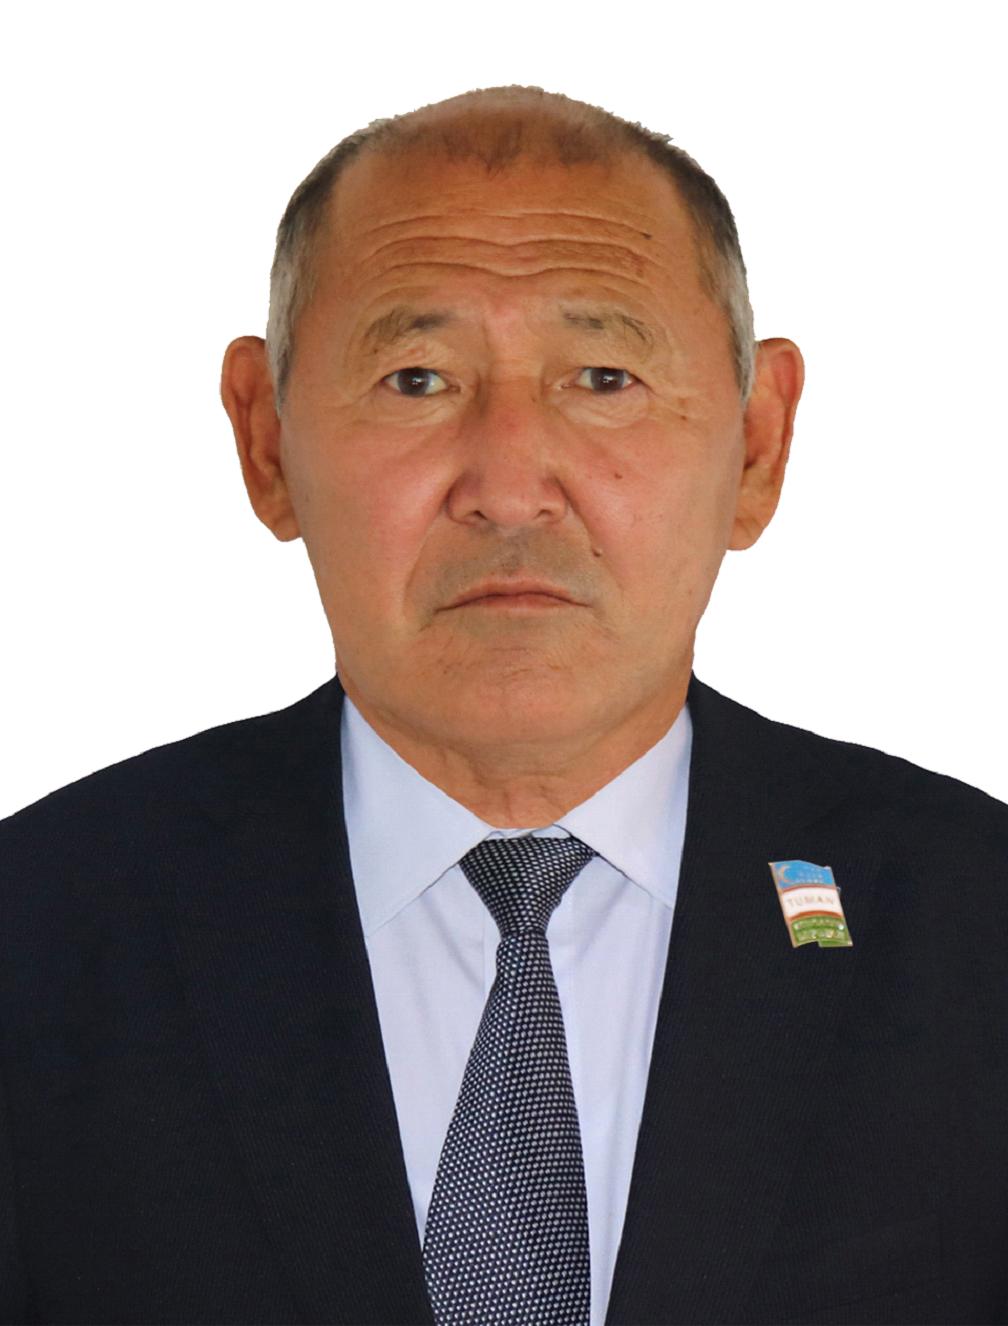 Абдираманов Жомард Нажмиддинович,